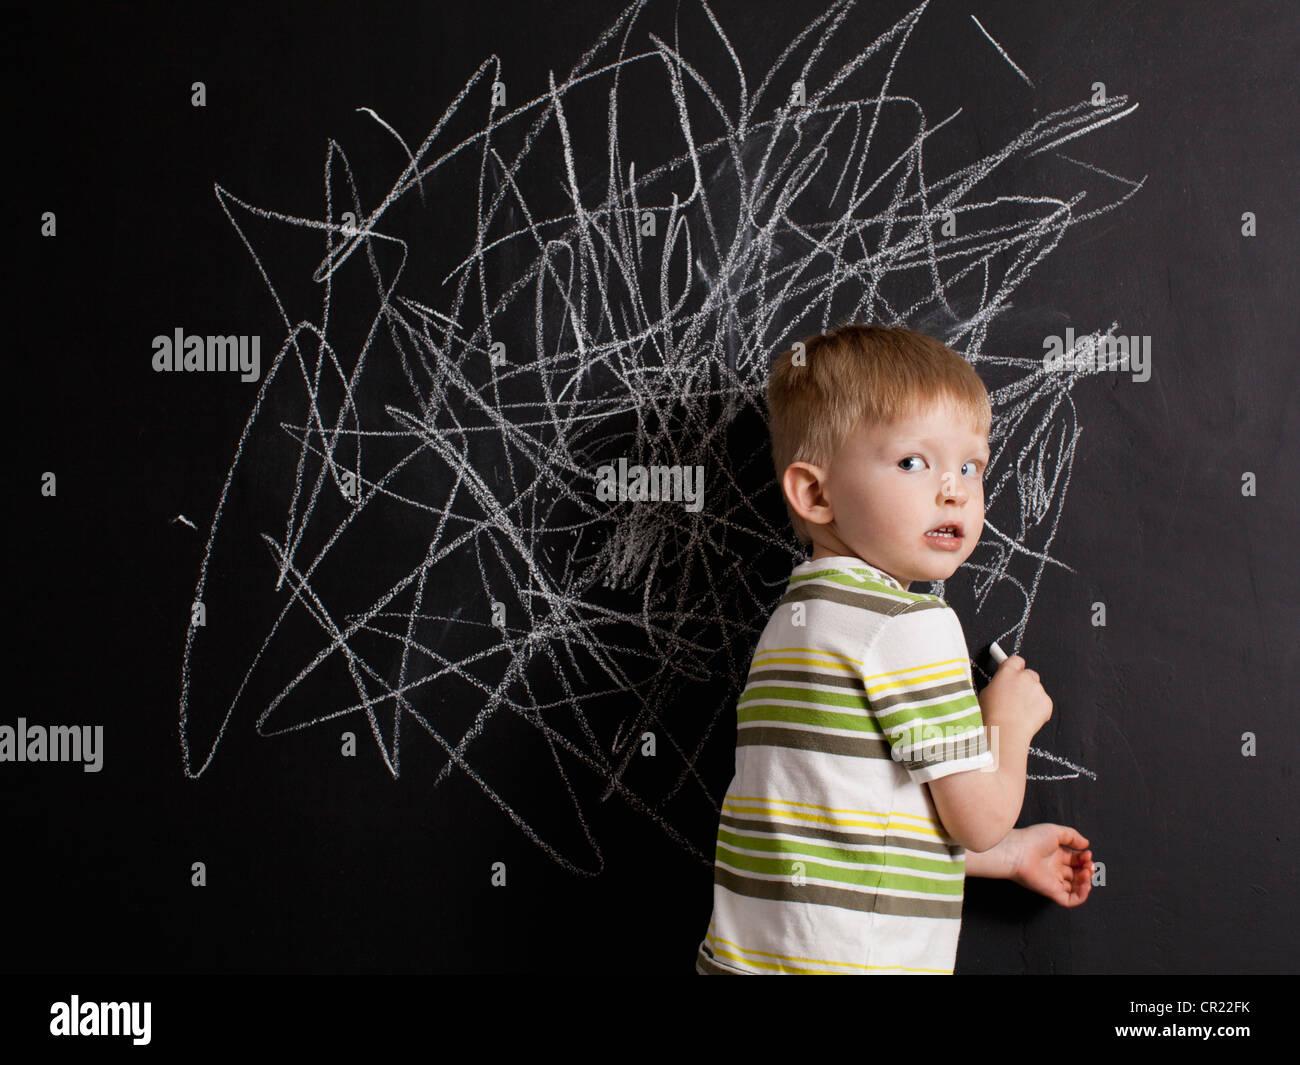 Cute toddler boy (2-3) standing against blackboard with daub written in chalk - Stock Image